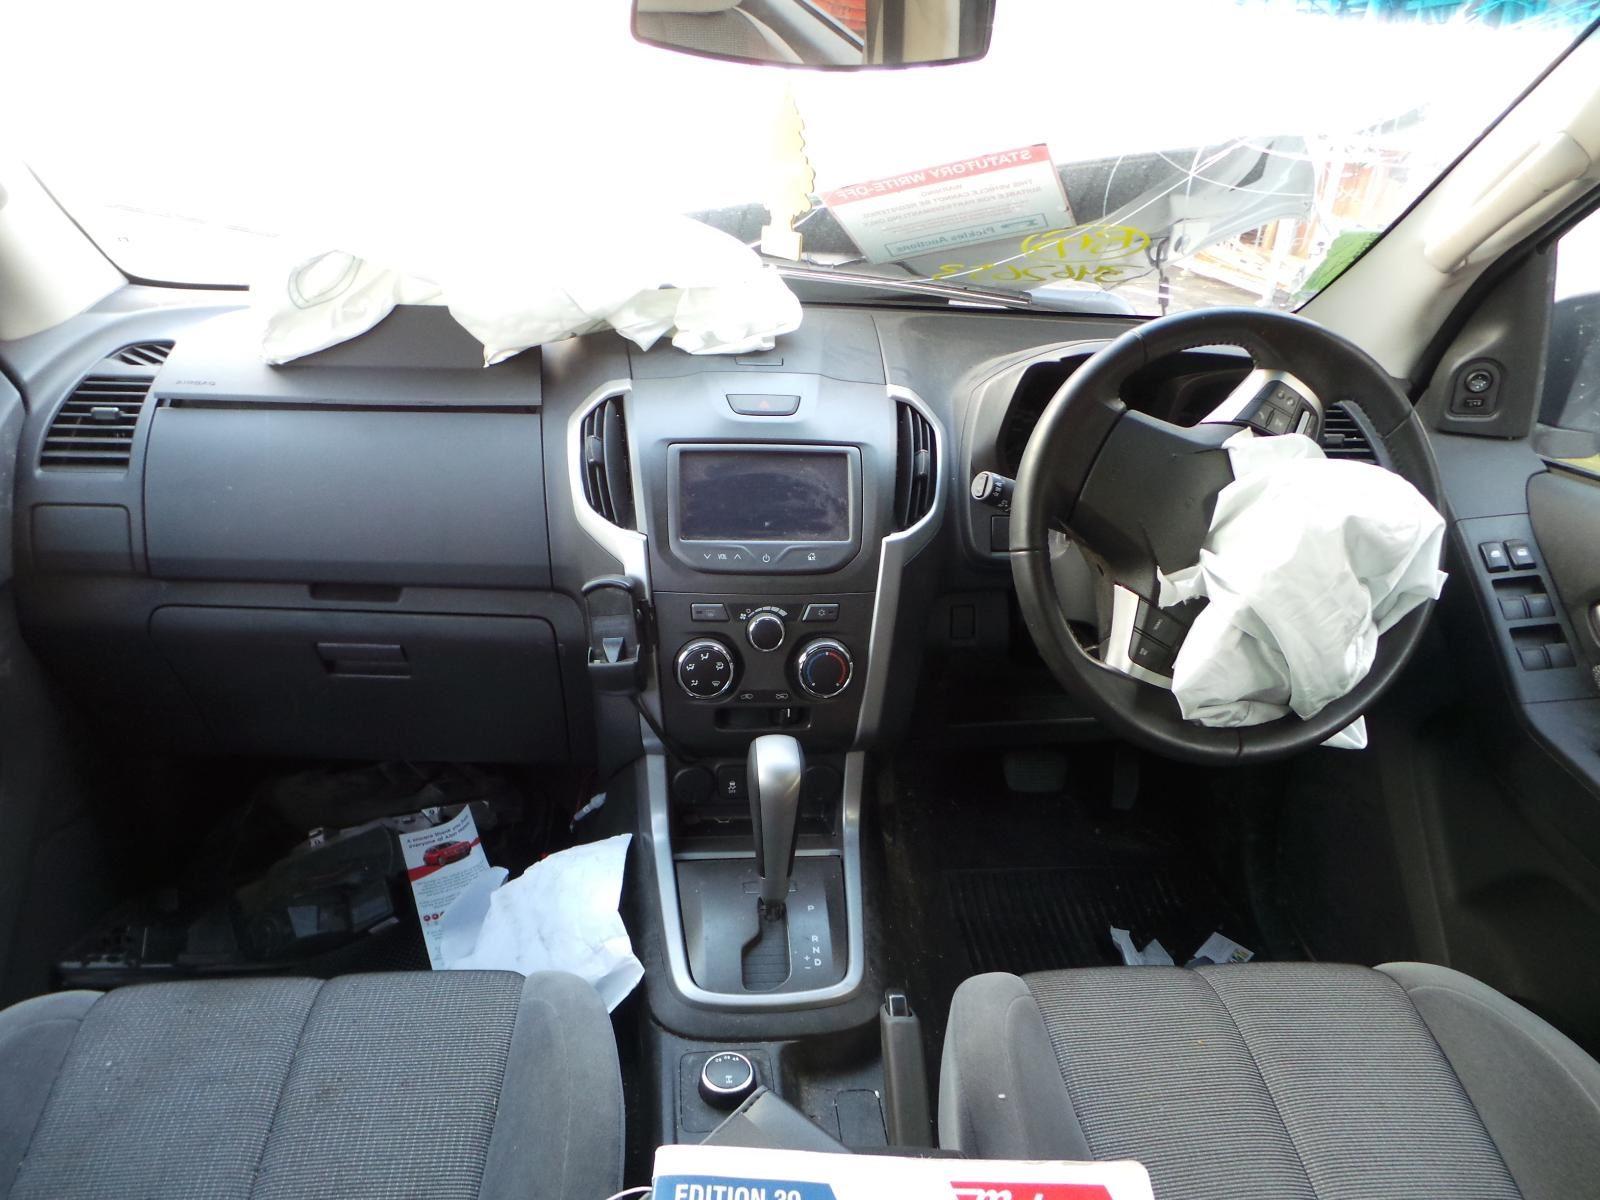 Holden Colorado Fuse Box Under Dash Rg Trade Me Nz Click To Enlarge Photo